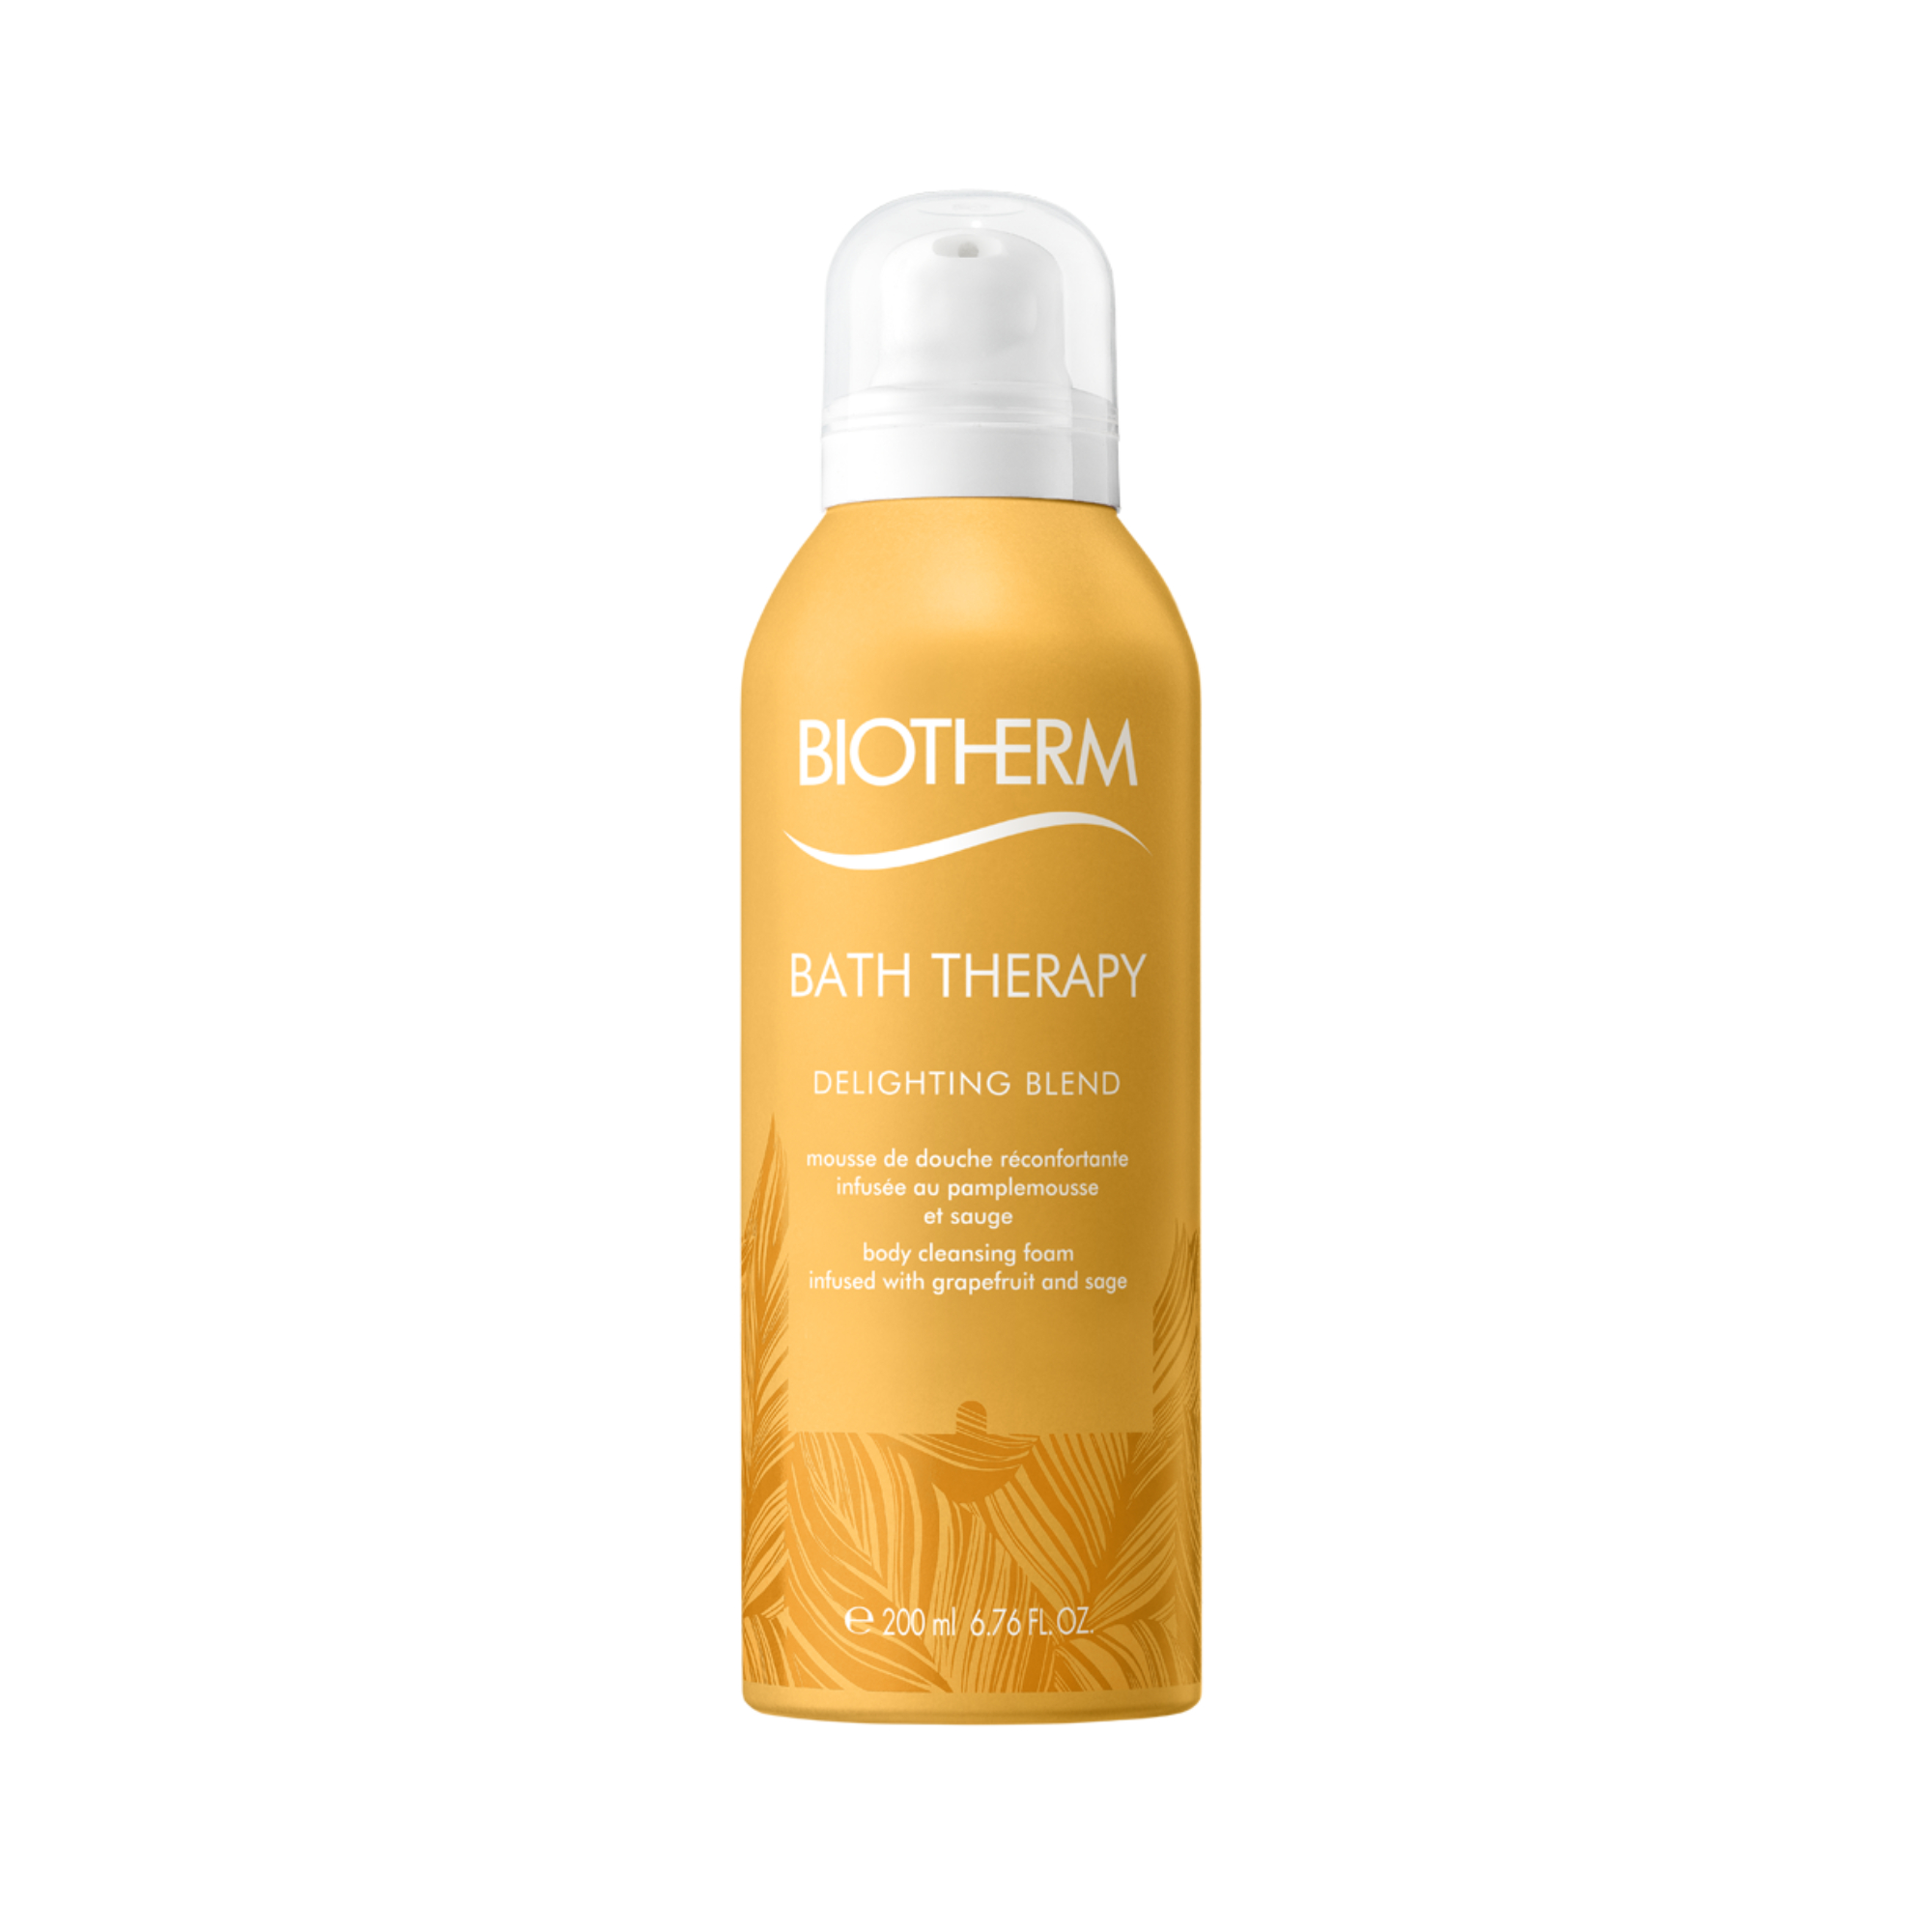 Biotherm Bath Therapy Delighting Foam, 200 ml